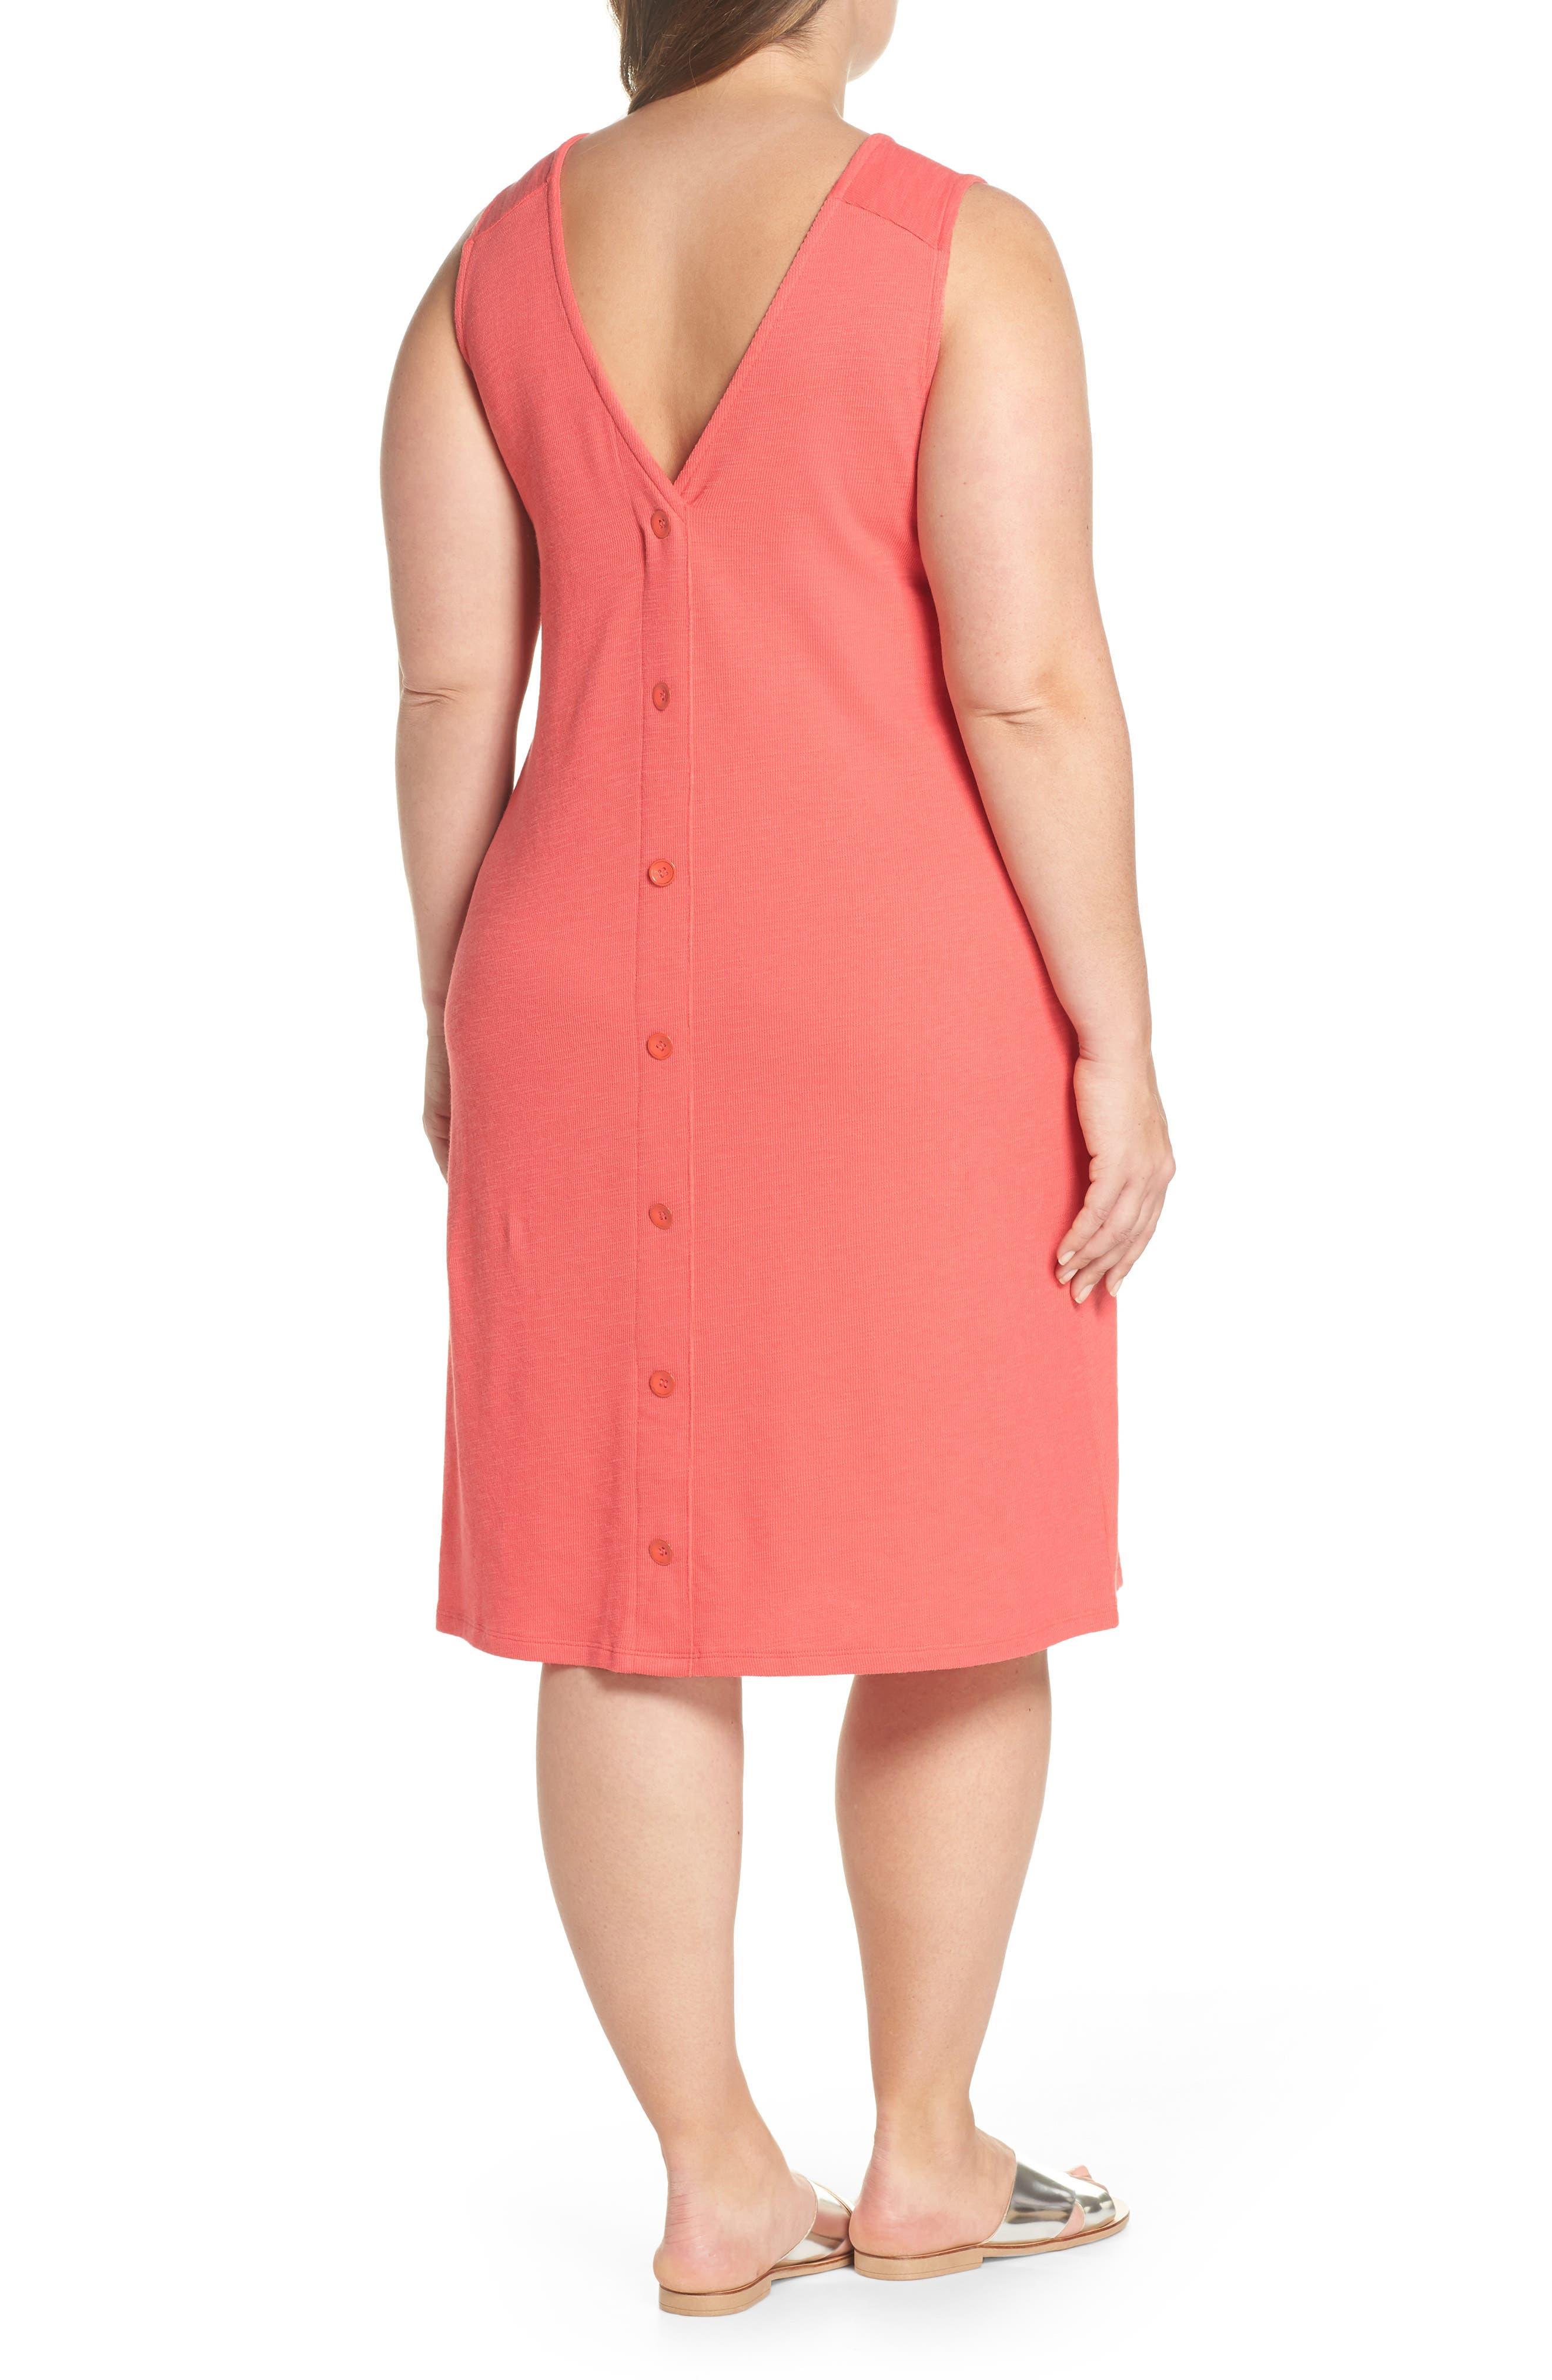 Button Back Knit Dress,                             Alternate thumbnail 2, color,                             Coral Rose